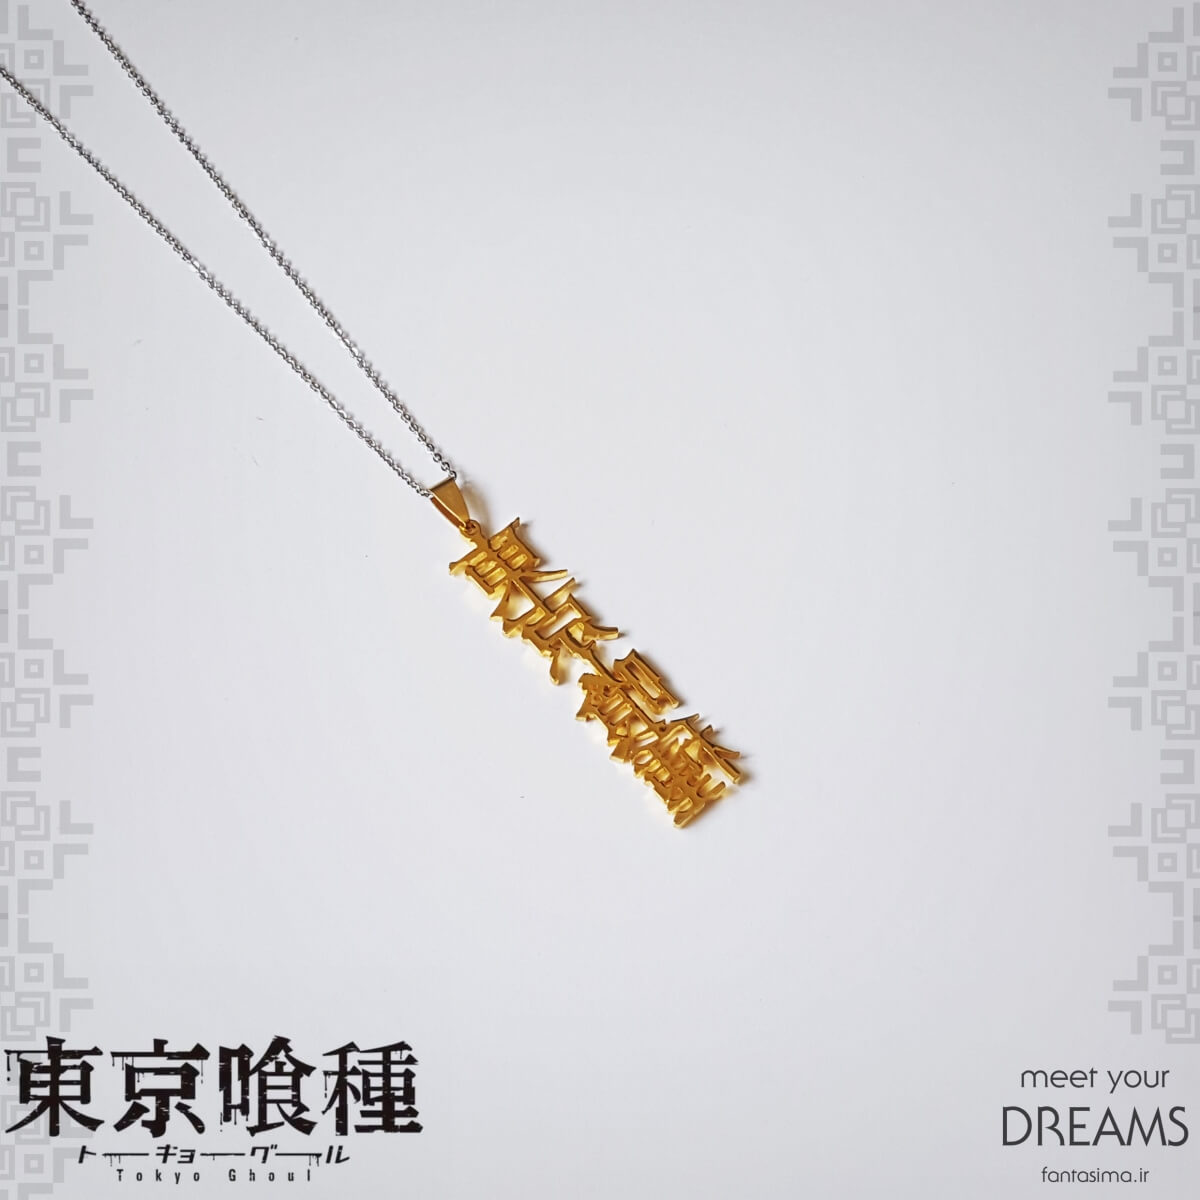 گردنبند حروف ژاپنی توکیو غول - طلایی